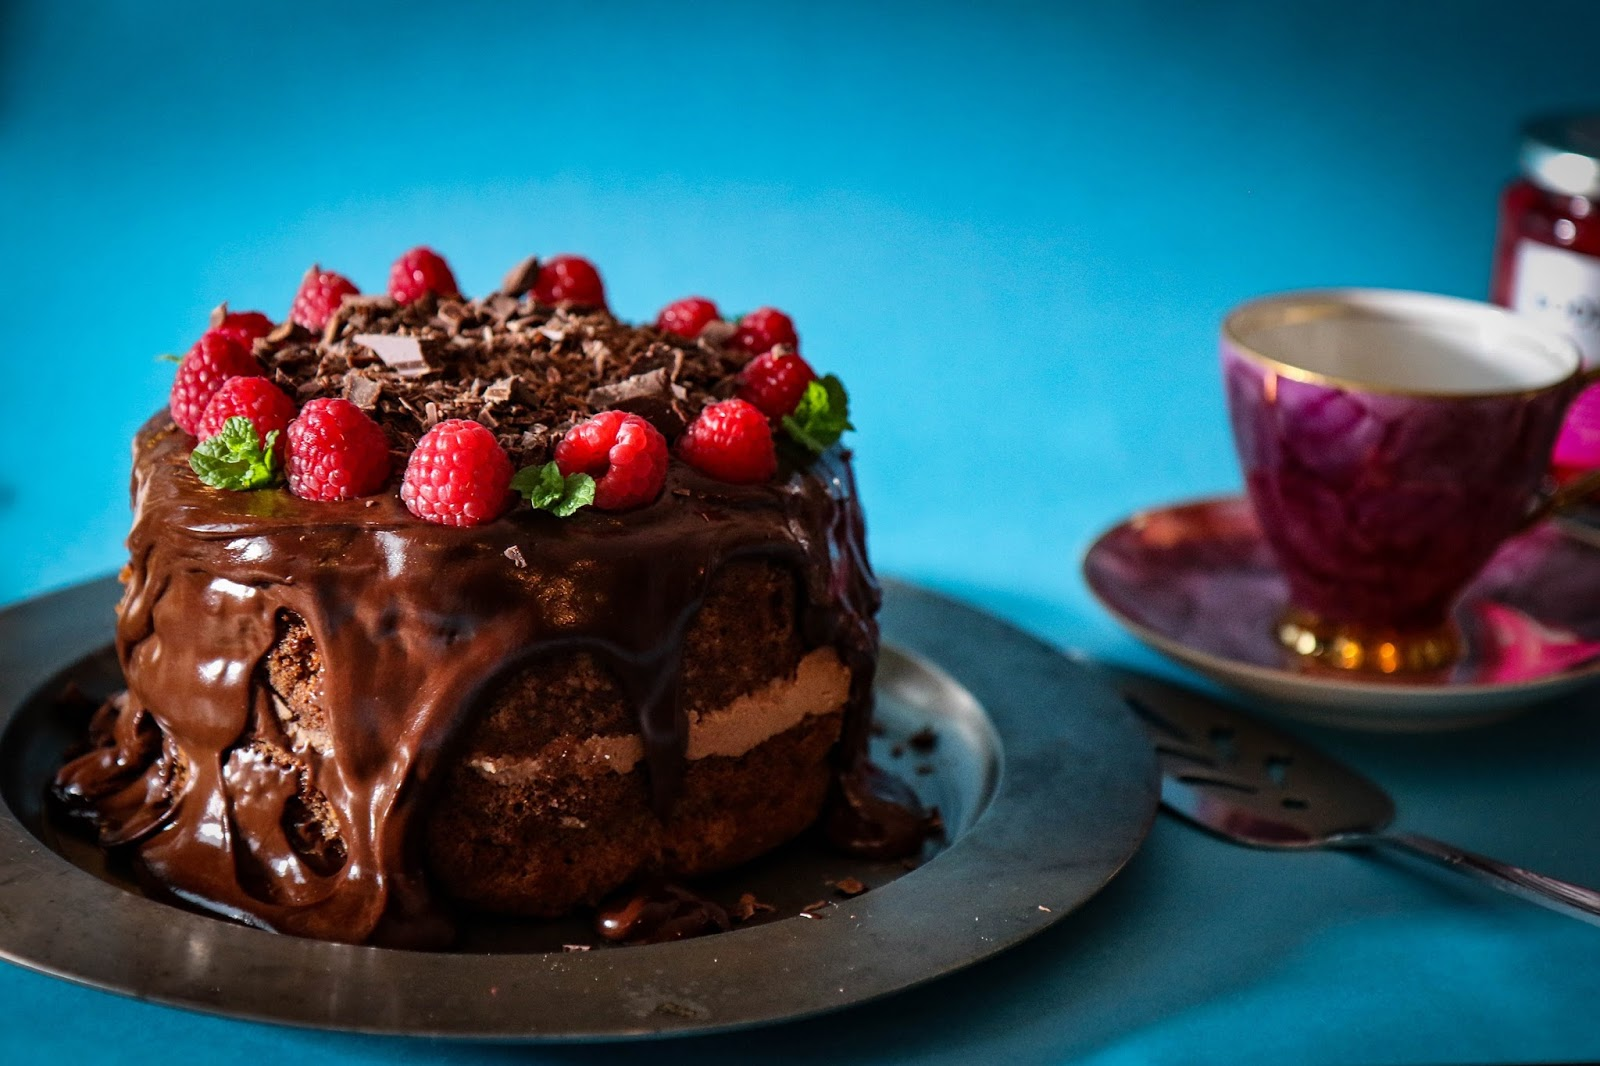 A Berry Boozy Chocolate Cake